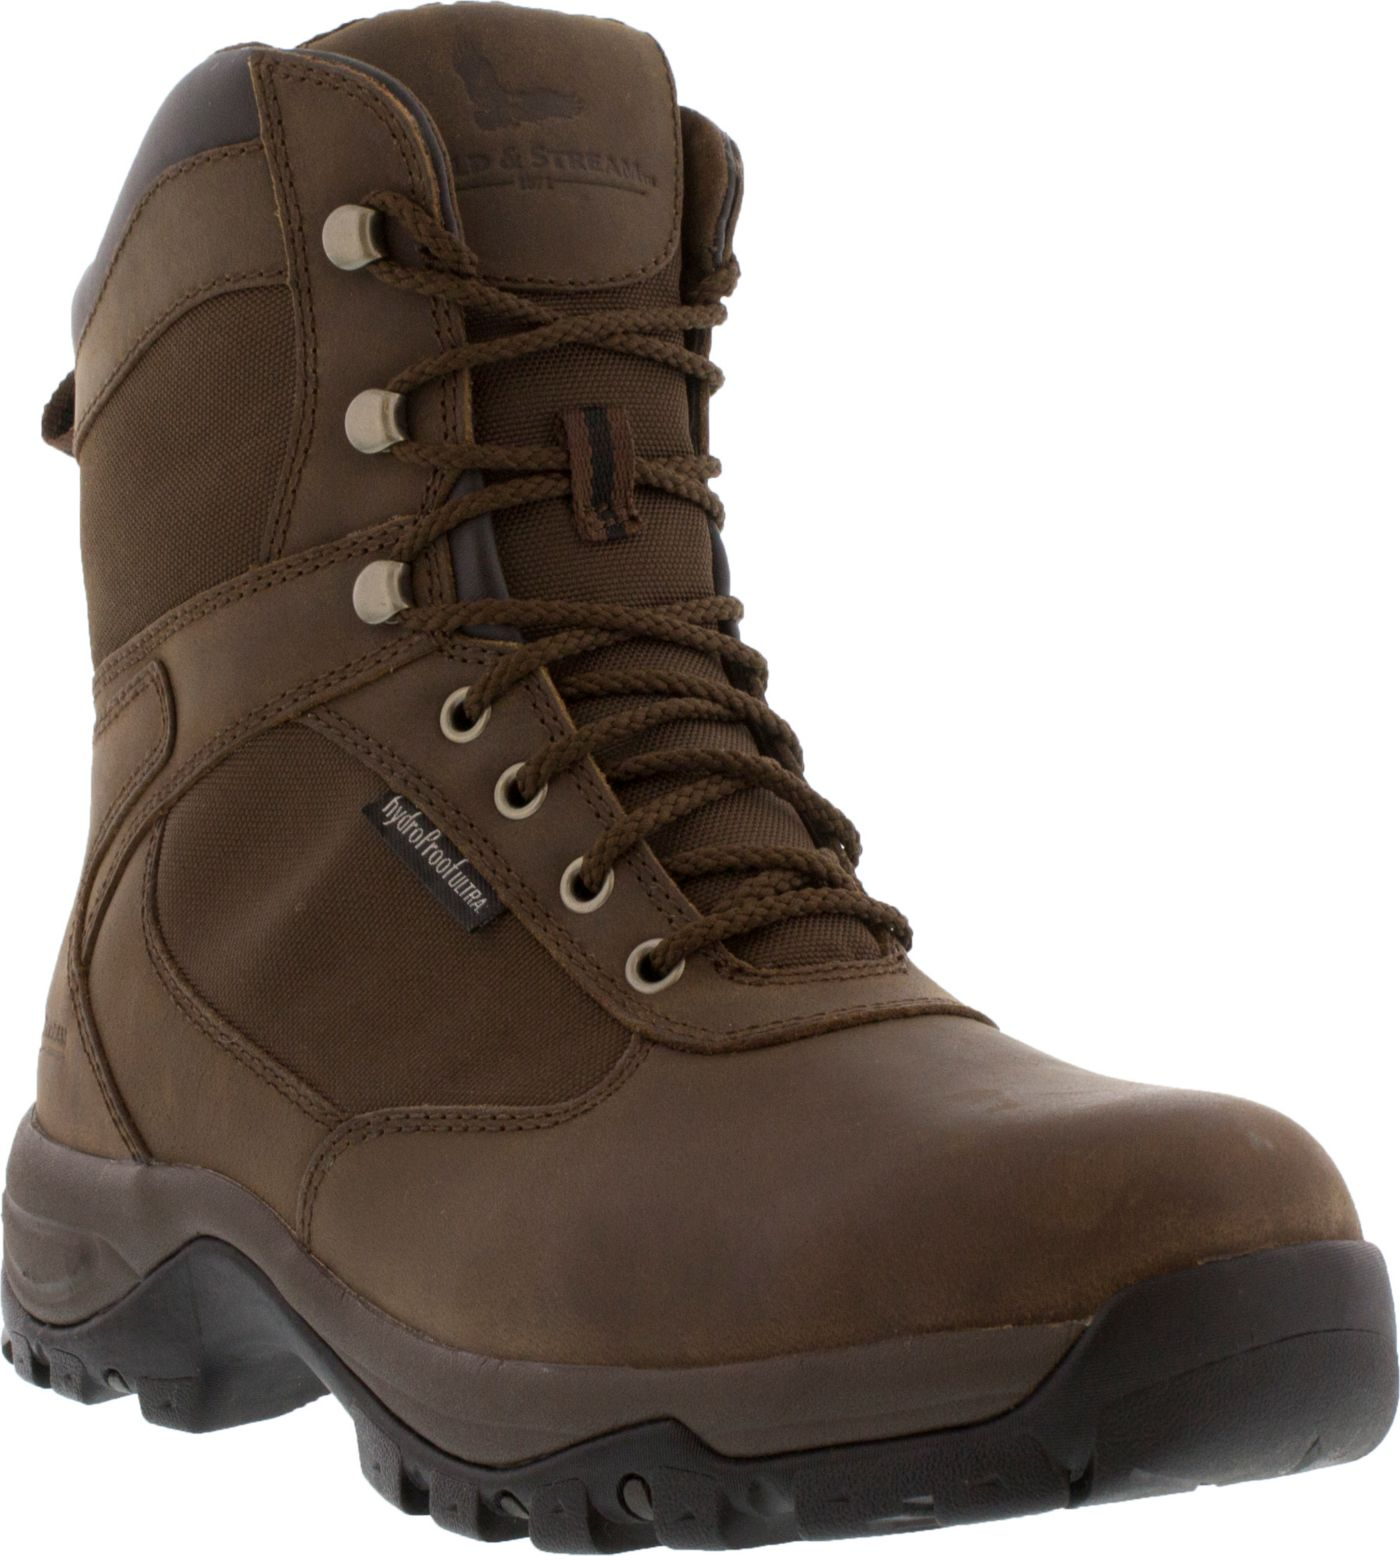 Field & Stream Men's Woodsman 800g Waterproof Hunting Boots